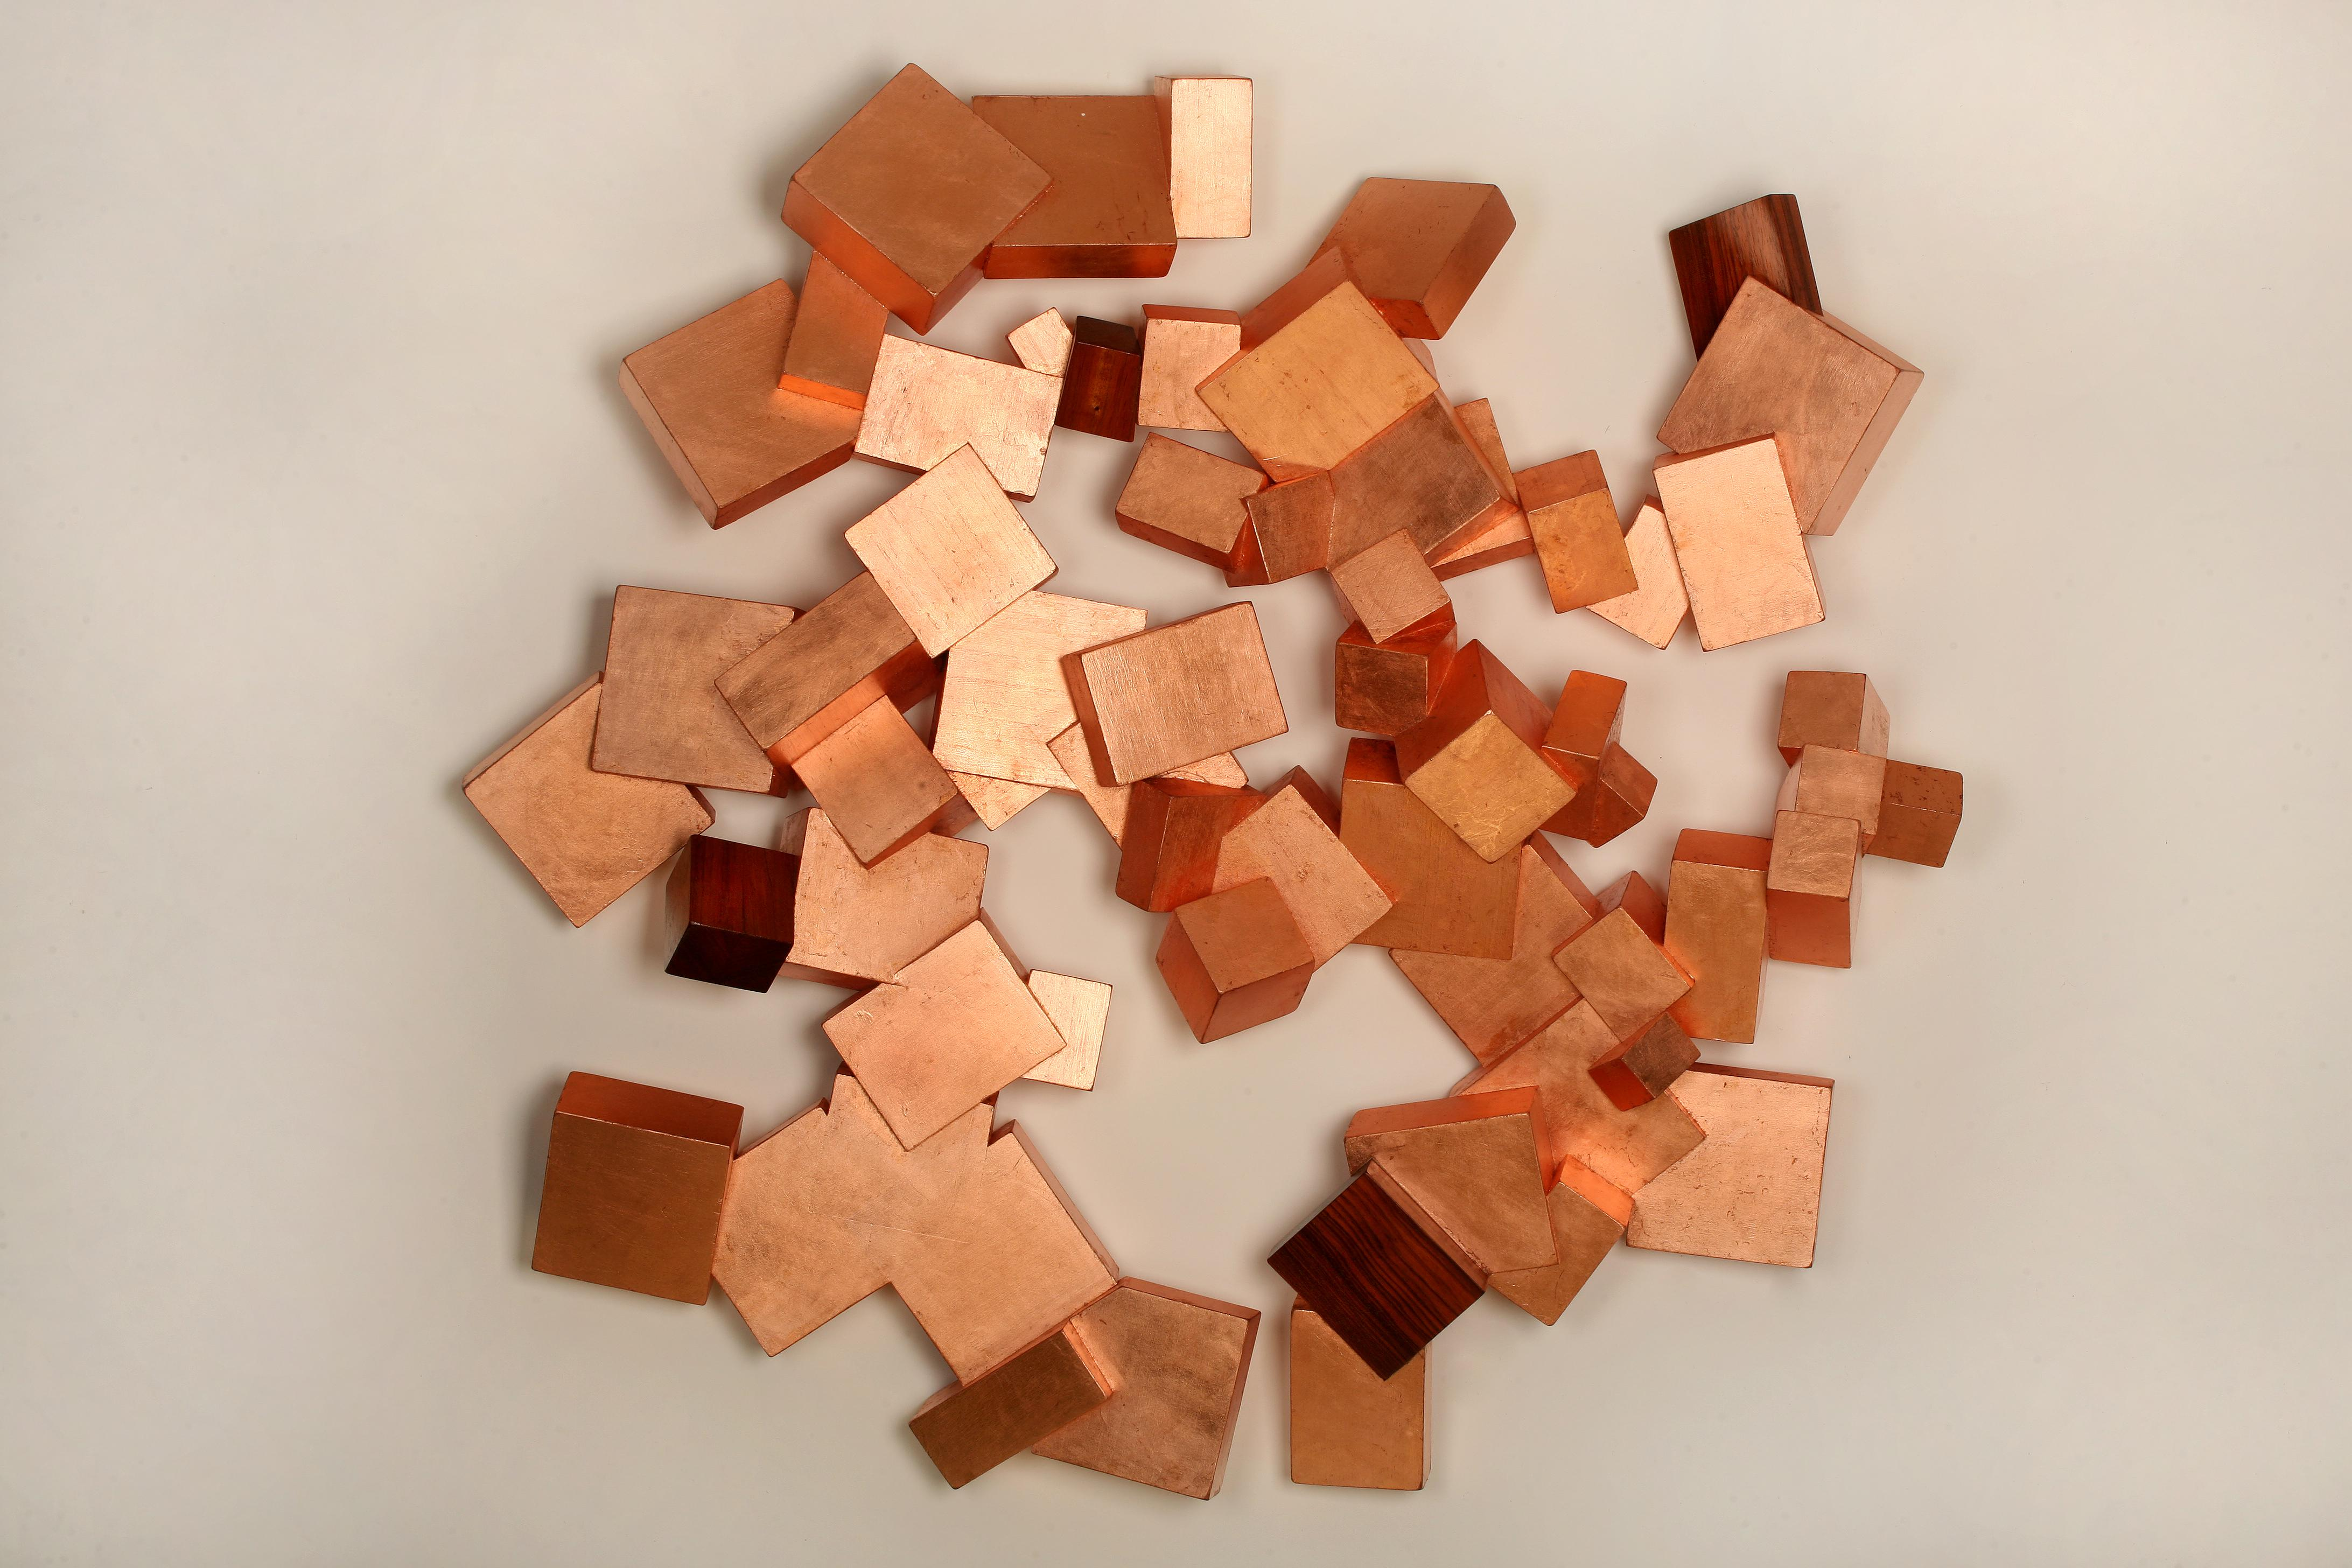 Copper and Boiree Pyrite (wood, metallic art, wall sculpture, cubic, geometric)